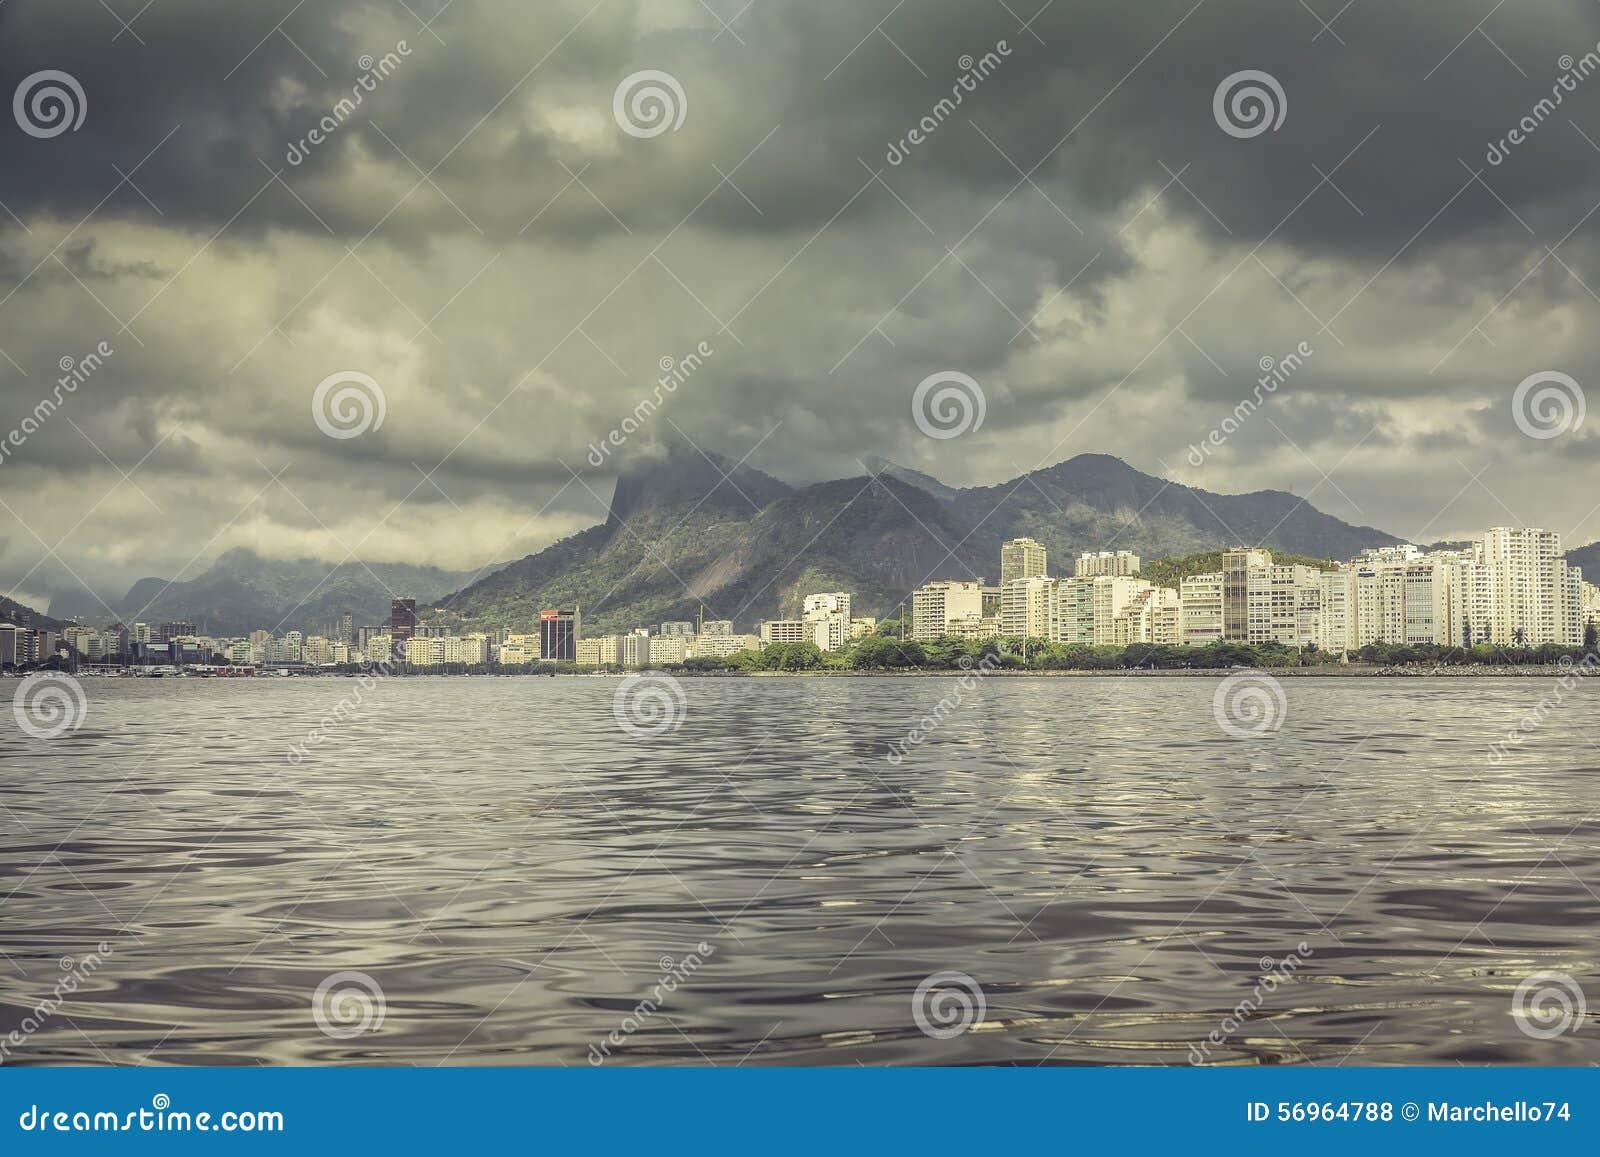 Guanabara Bay with dark clouds,Rio de Janeiro